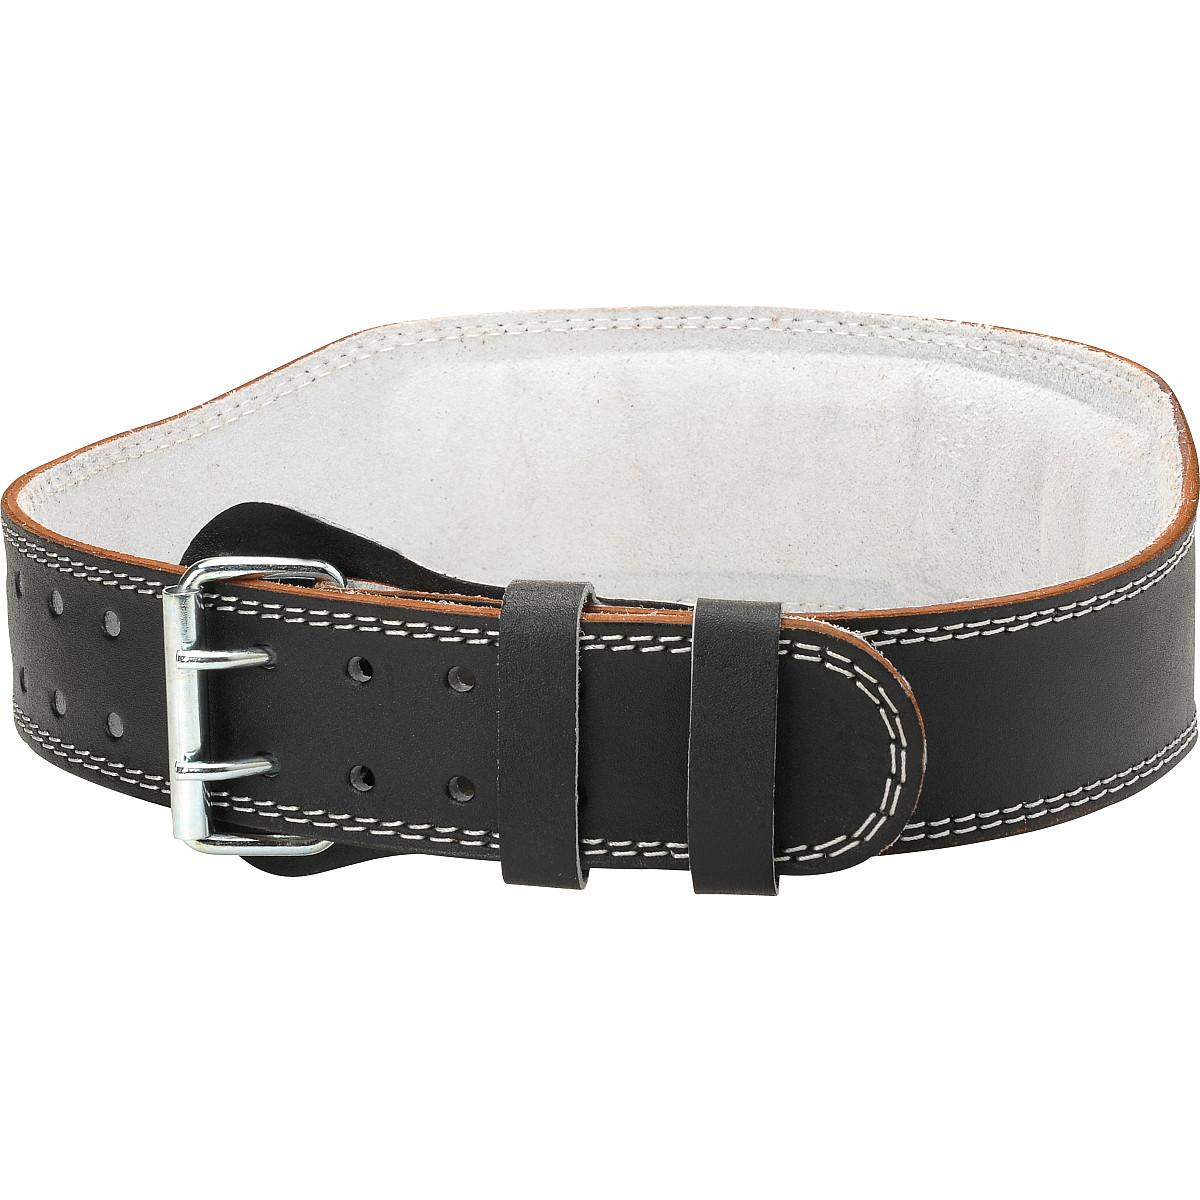 Belt Lifts: Padded Belts